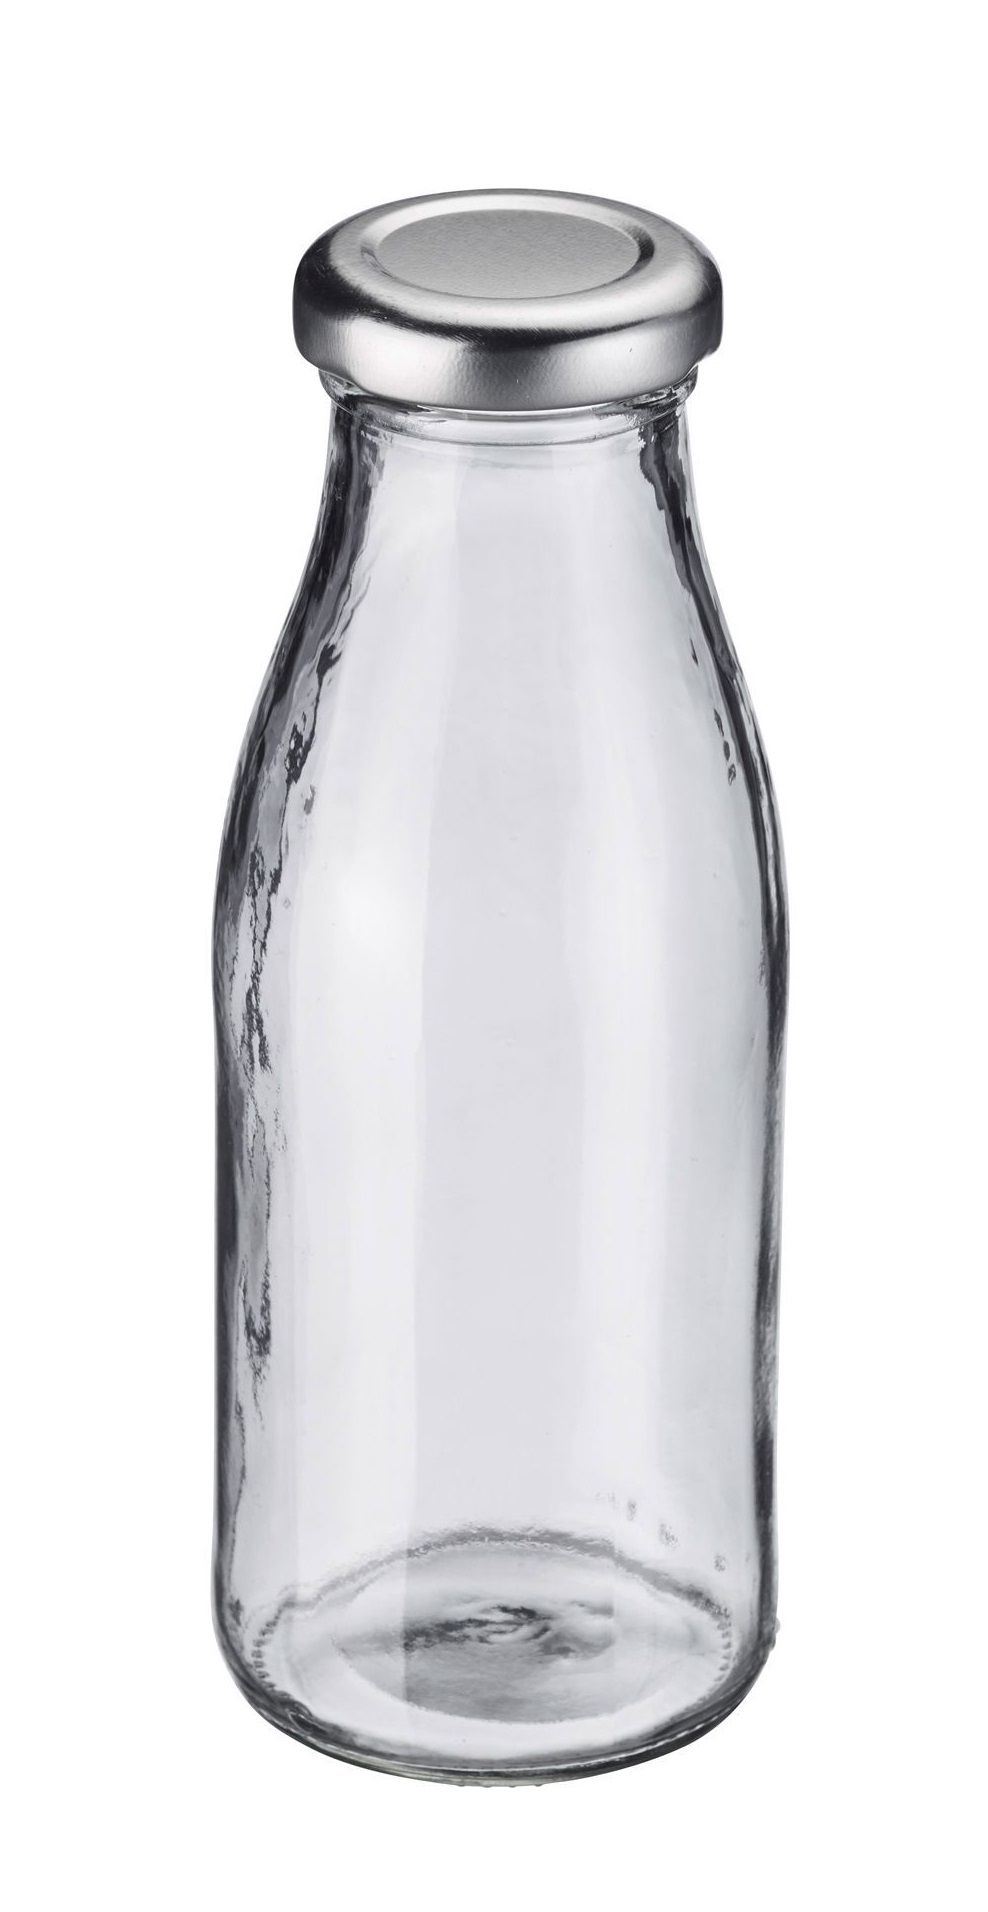 Westmark_Drinkfles_Rond_25cl